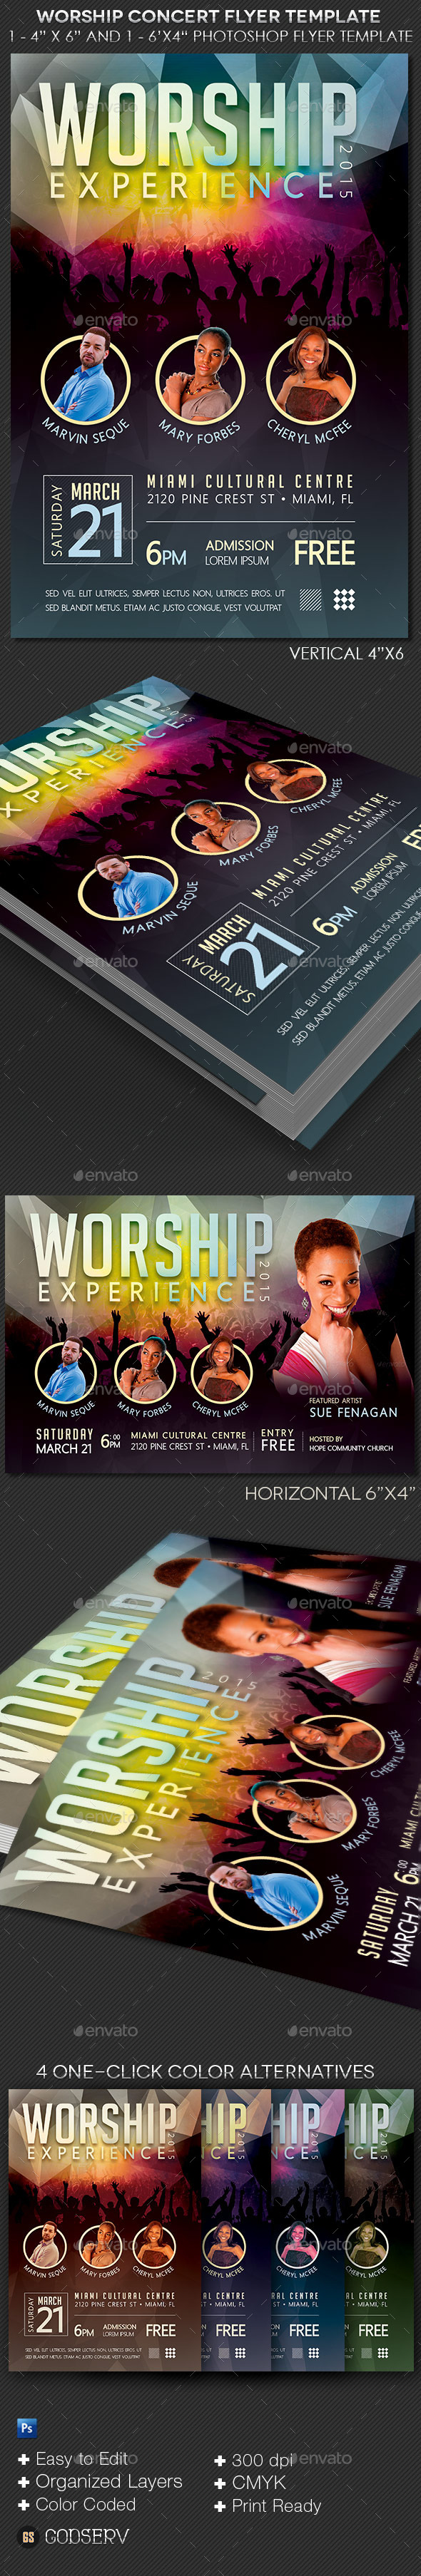 Worship Concert Flyer Template - Church Flyers